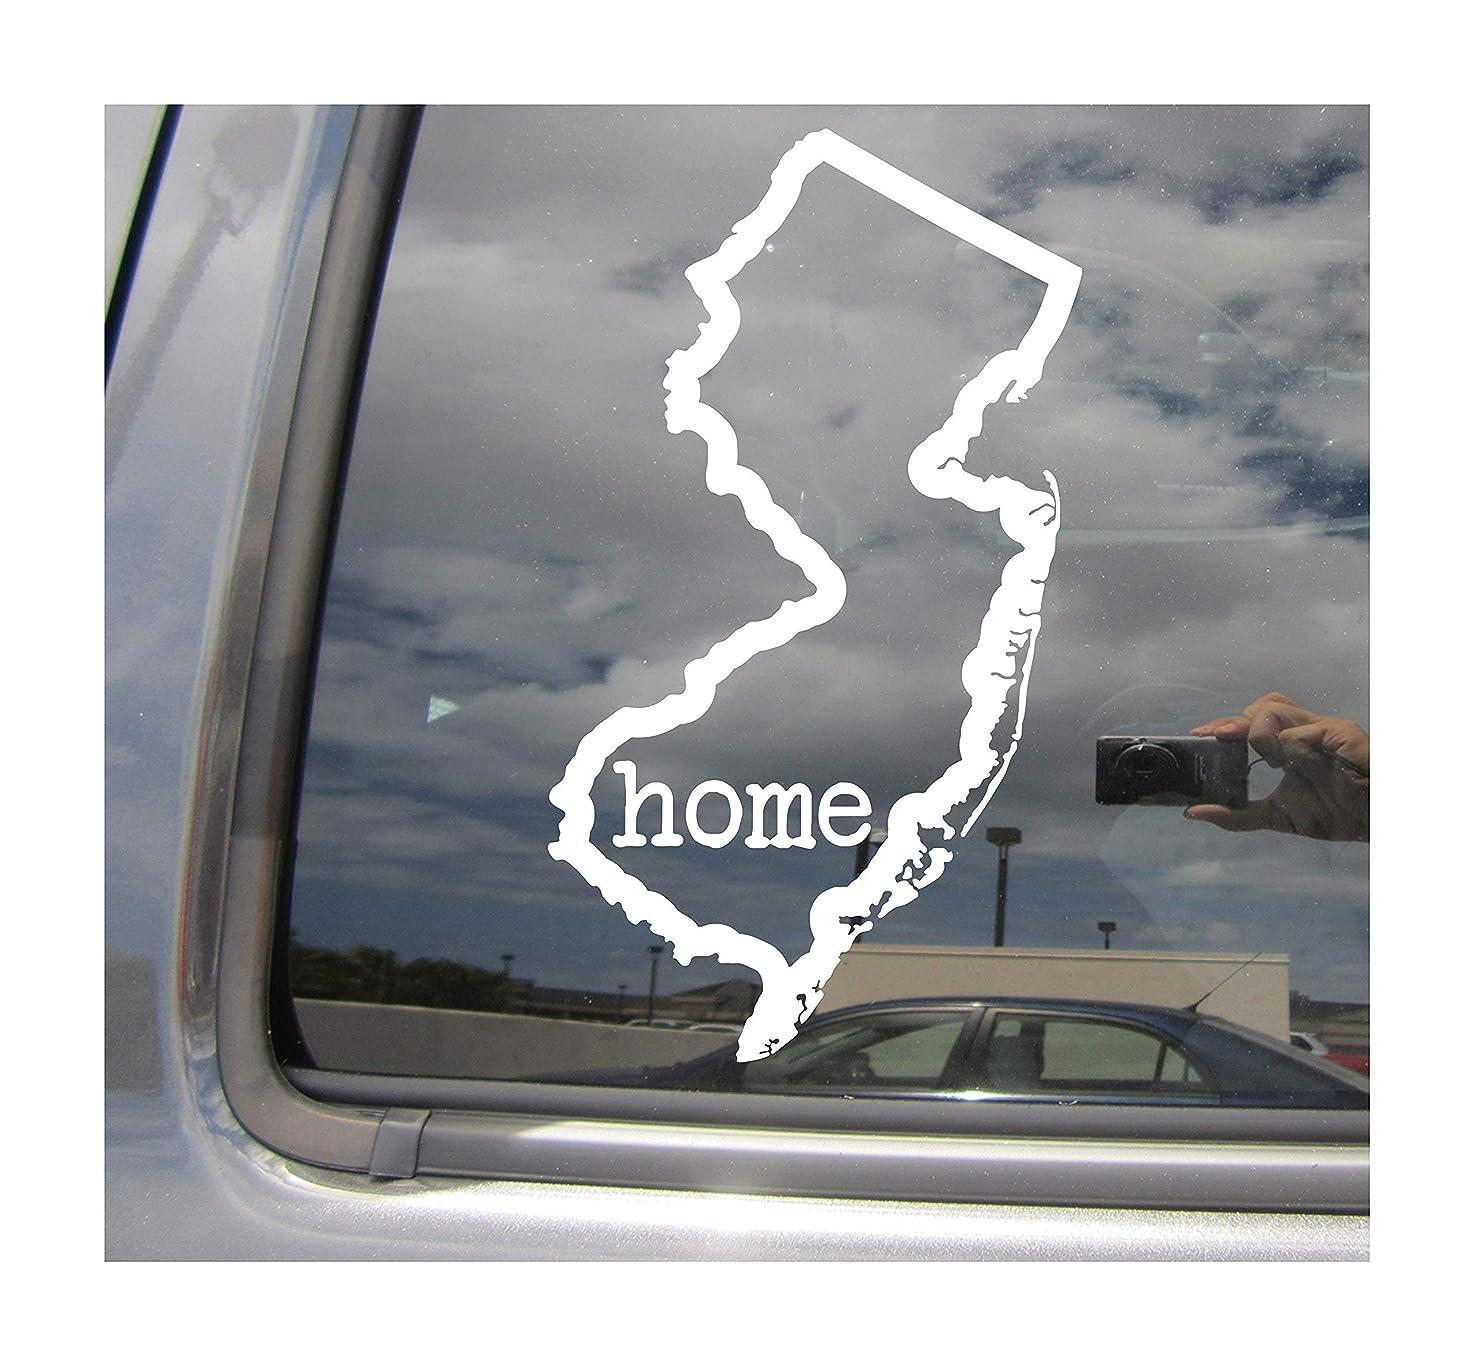 New Jersey State Home Outline - NJ Trenton Newark The Garden State USA America - Cars Trucks Moped Helmet Hard Hat Auto Automotive Craft Laptop Vinyl Decal Store Window Wall Sticker 07030